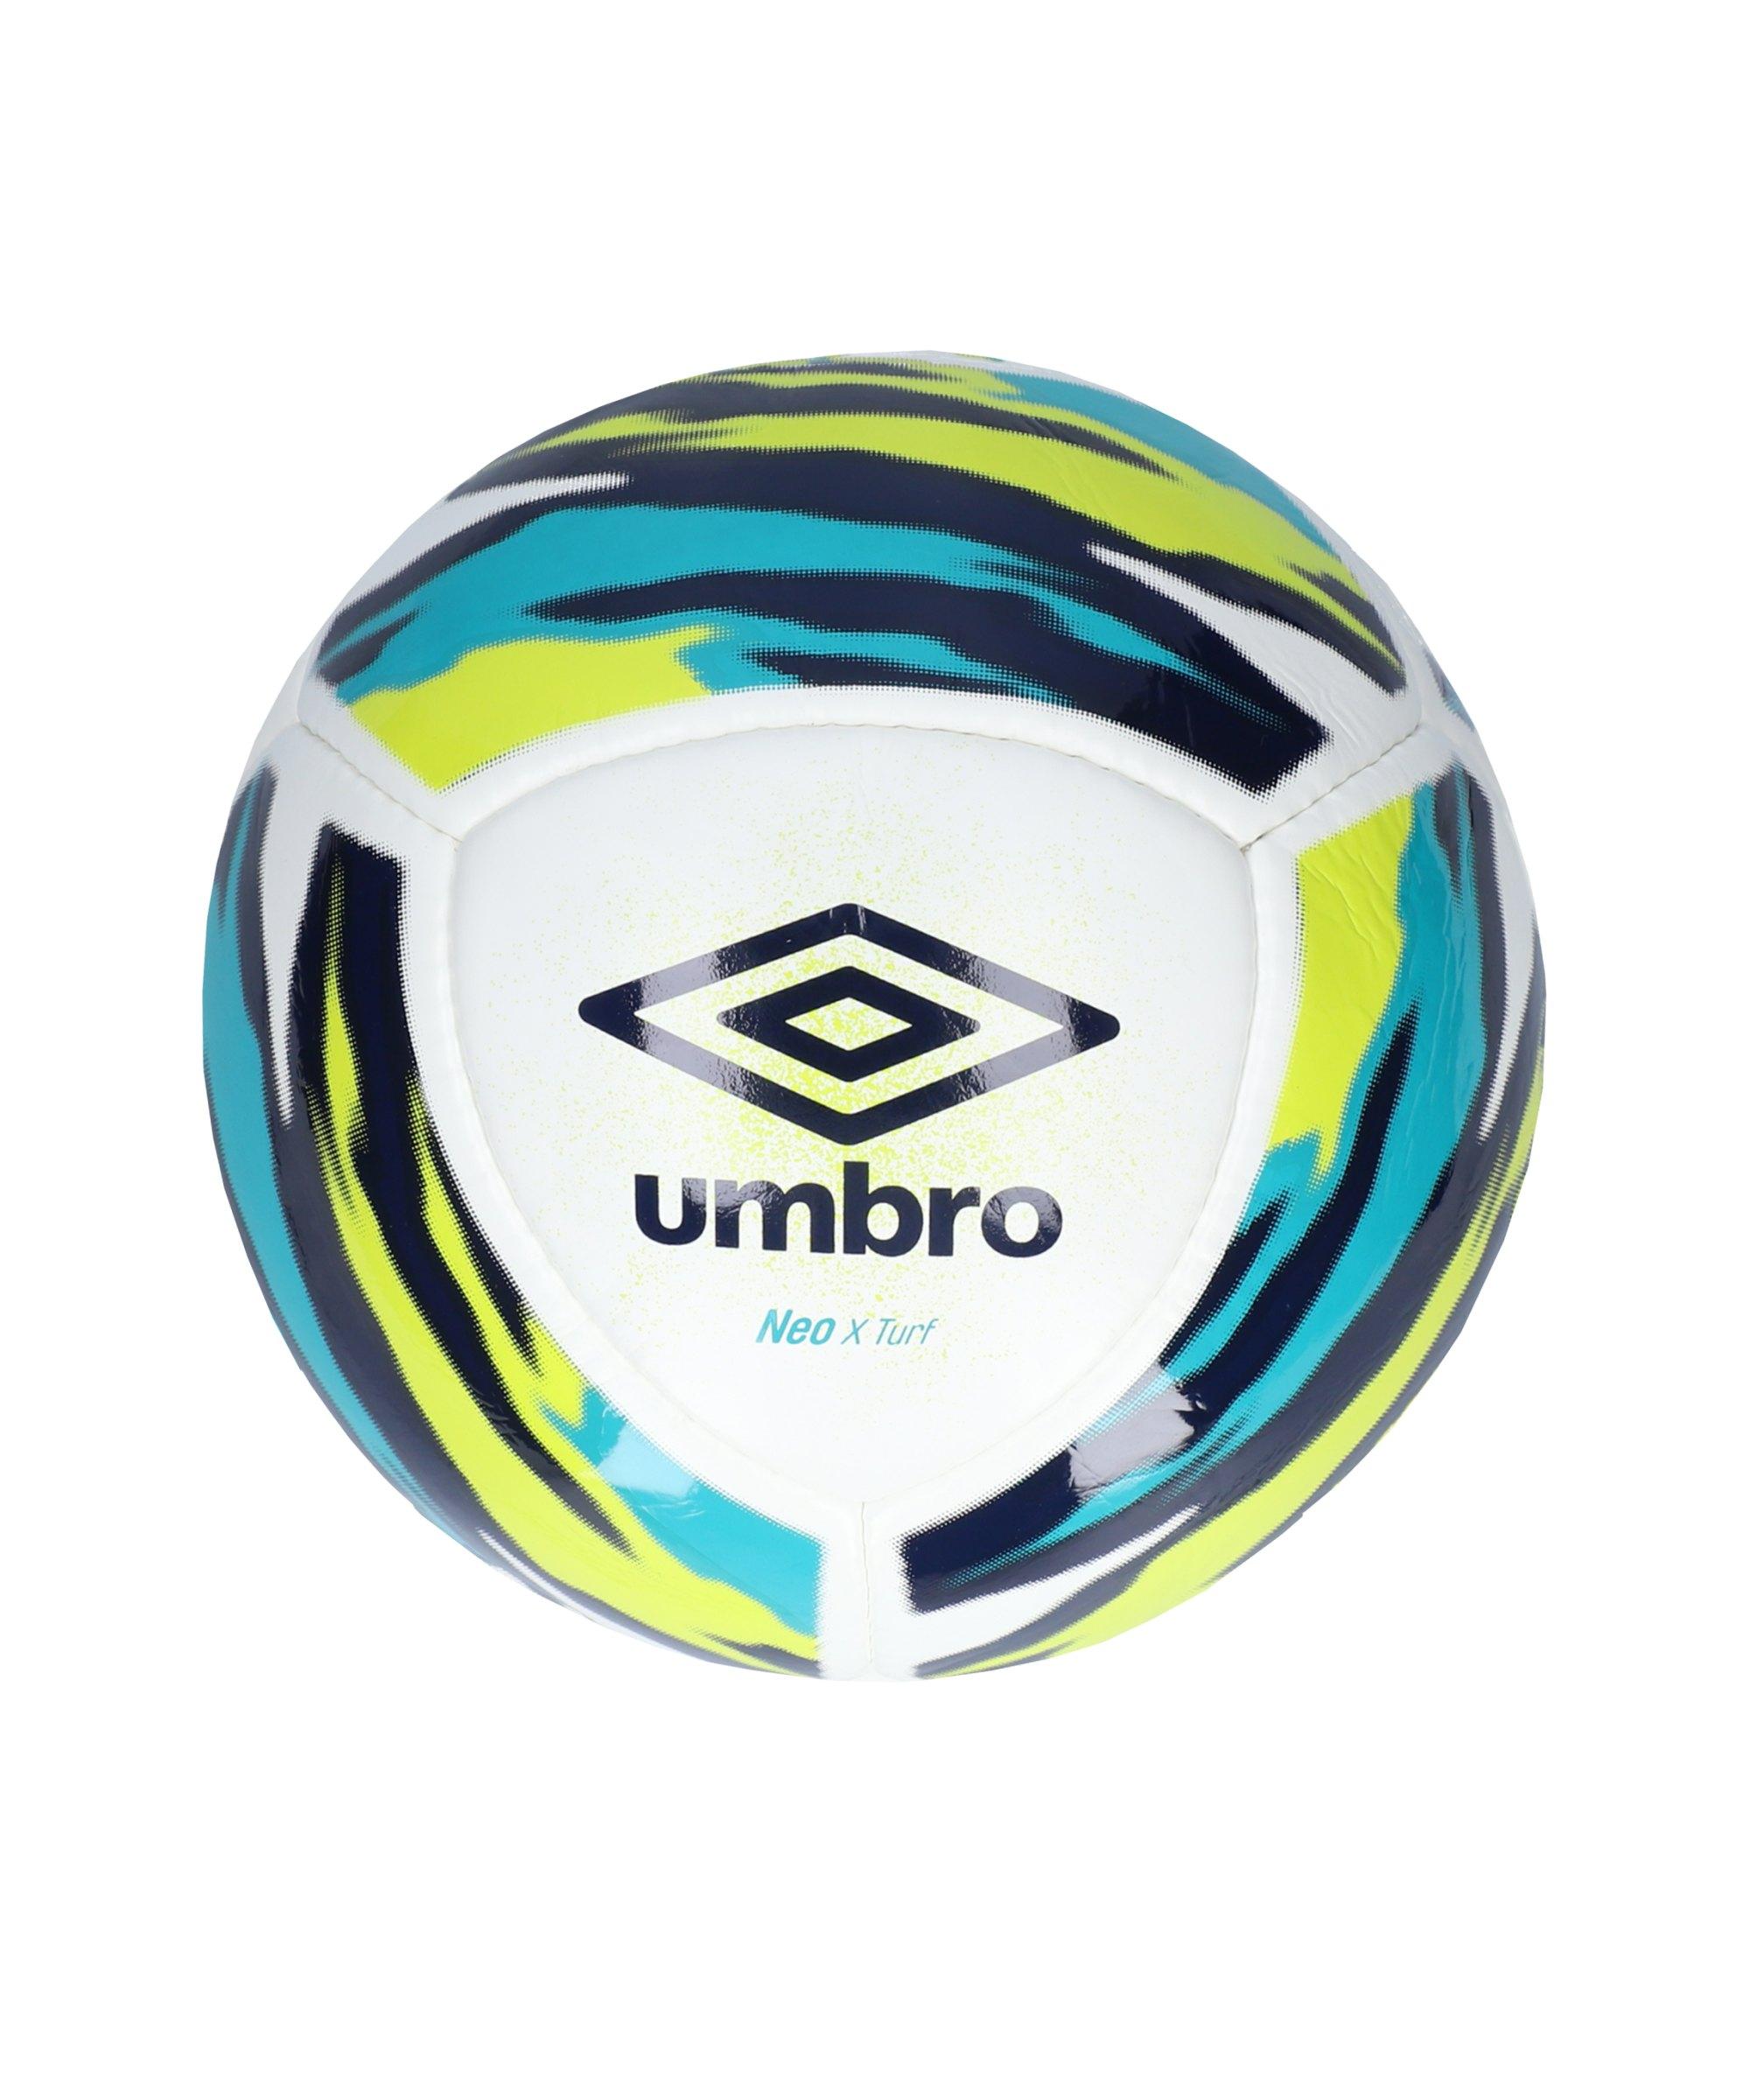 Umbro Neo X Truf Spielball Weiss Blau FJPA - weiss